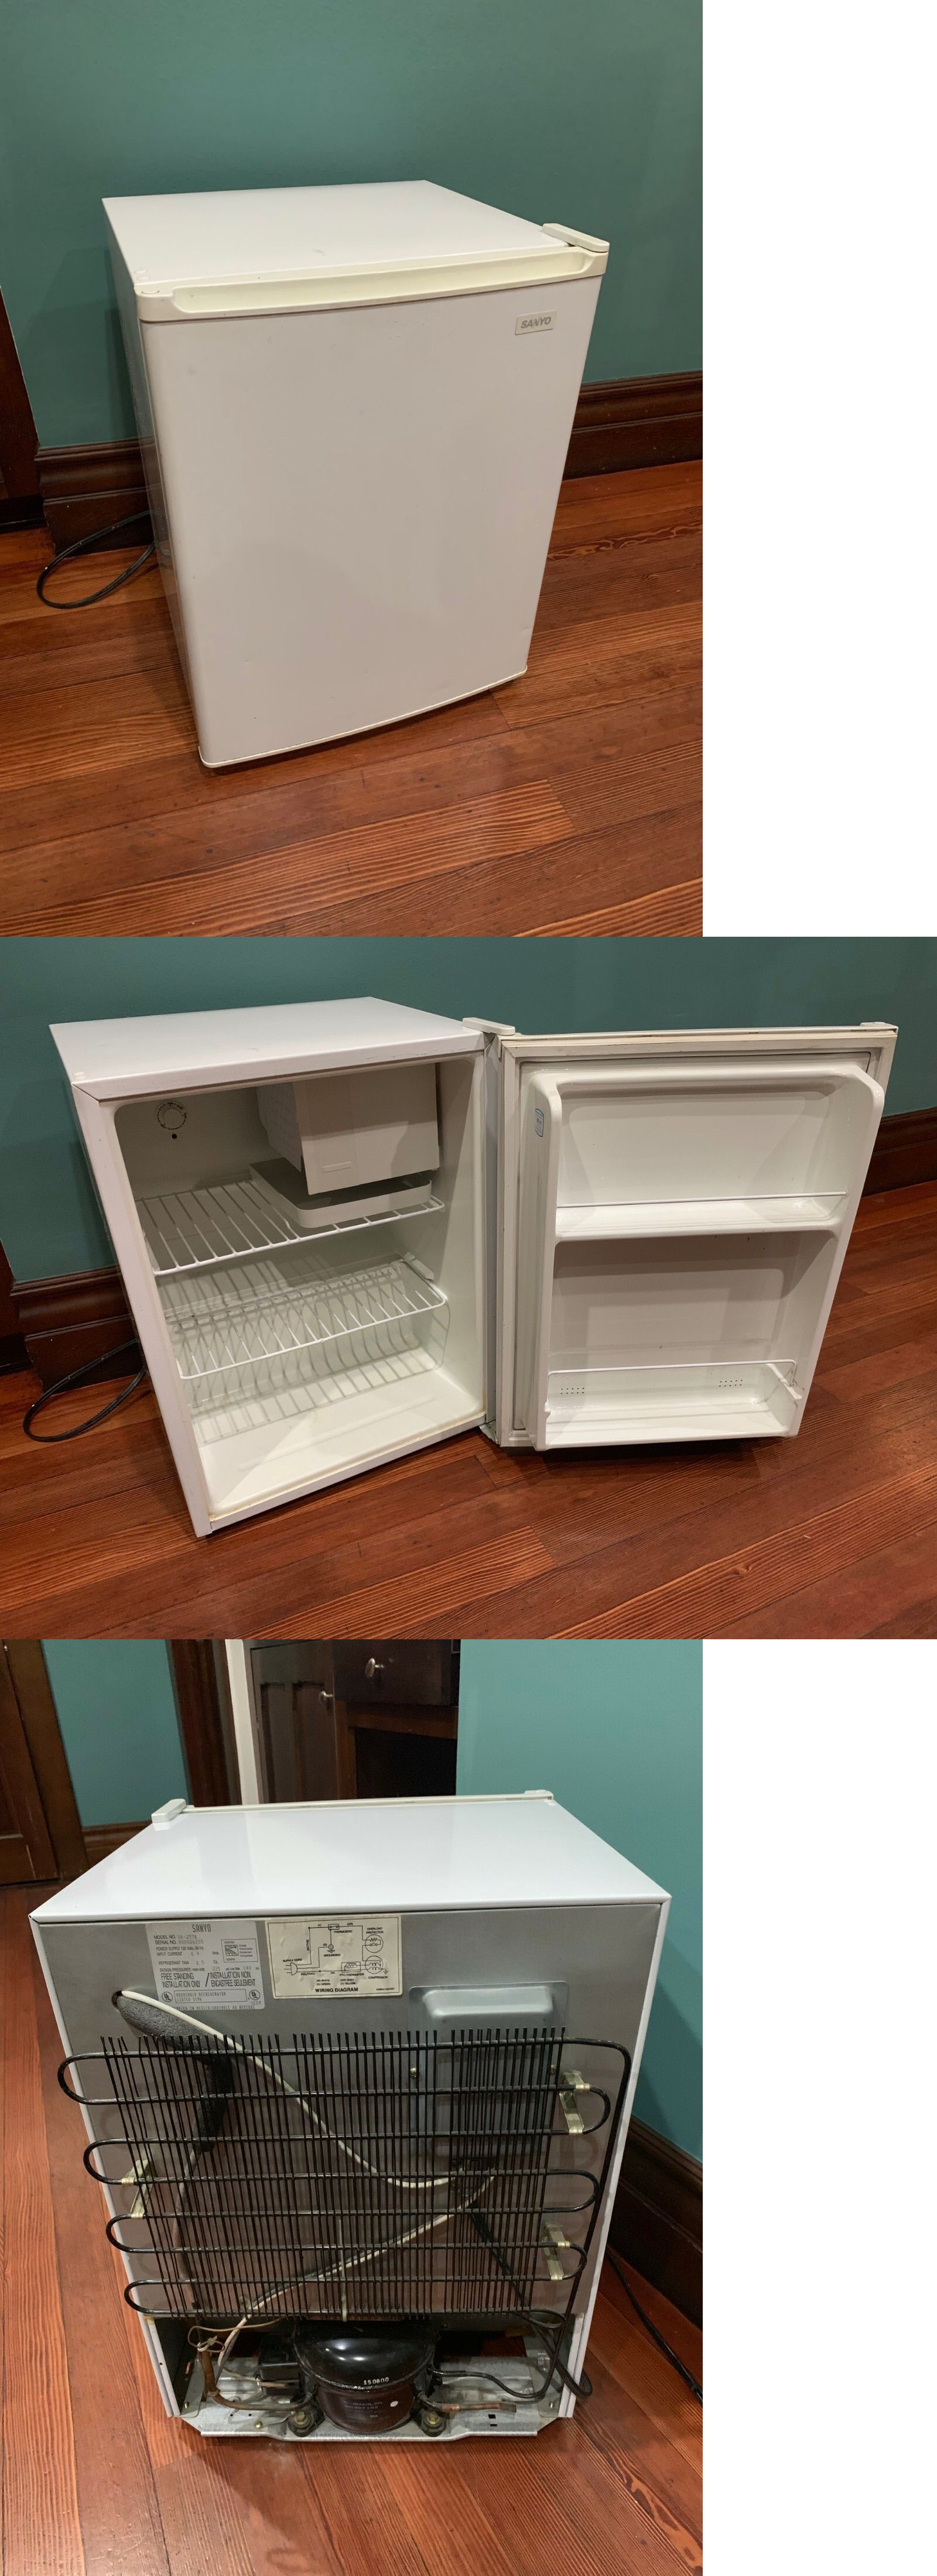 small resolution of mini fridges 71262 brand new sanyo sr 257w mini fridge buy it now only 45 on ebay fridges brand sanyo fridge